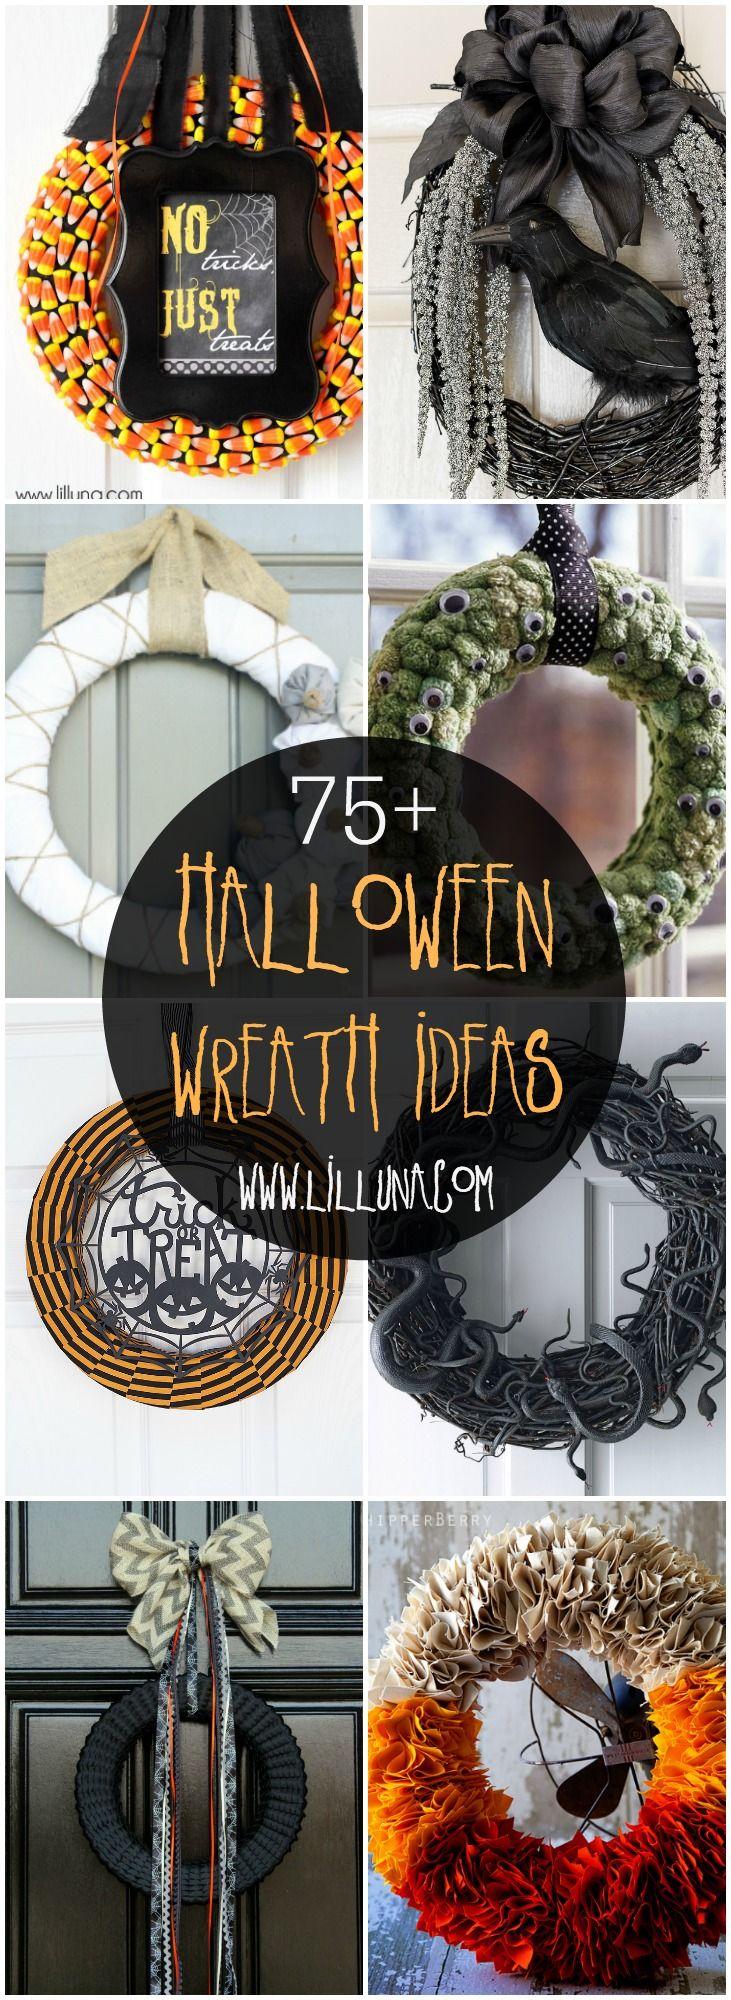 75+ Halloween Wreaths #halloweenwreaths